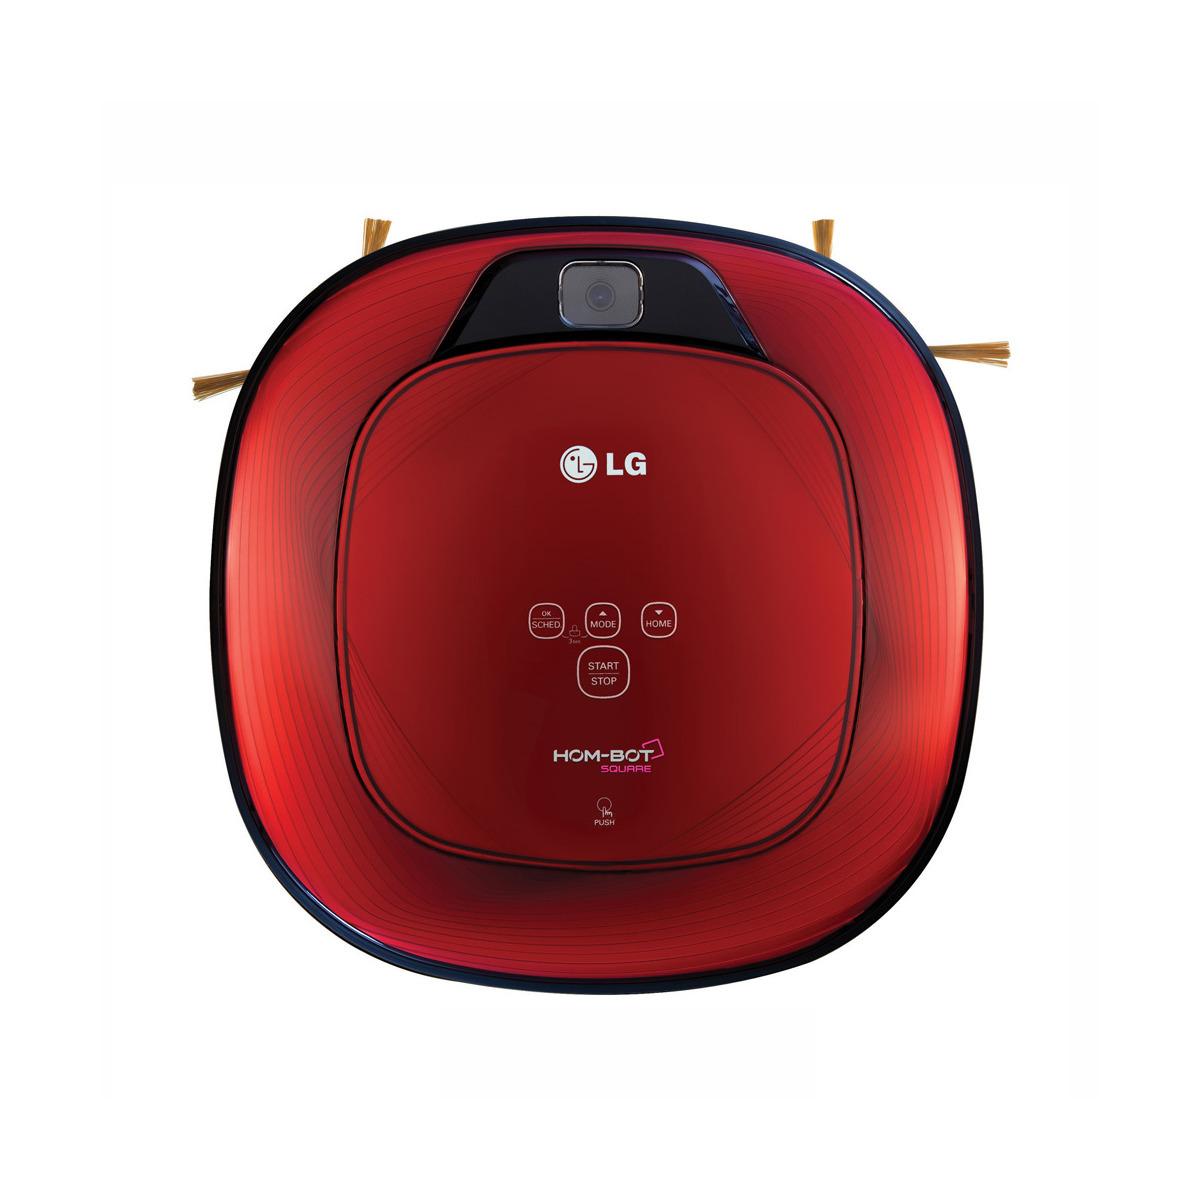 Robot aspirador LG Hombot cuadrado VR6270LVMB con sistema de alerta de voz